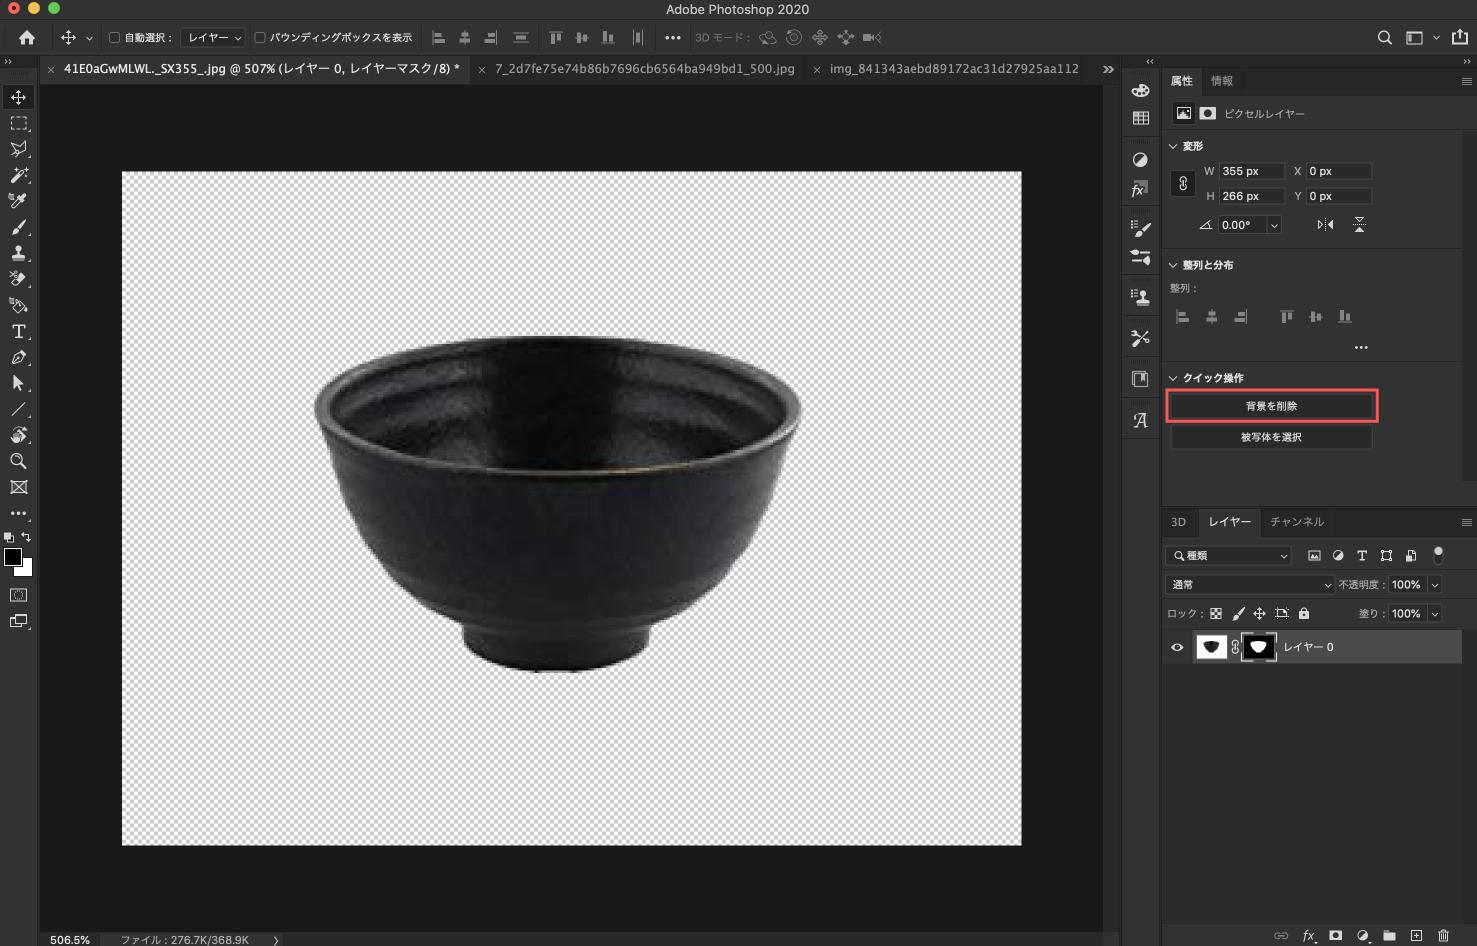 Adobe CC Photoshop フォトショップ 切り抜き 髪の毛 簡単 切り抜き 素材 読み込み クイック操作の背景を削除機能